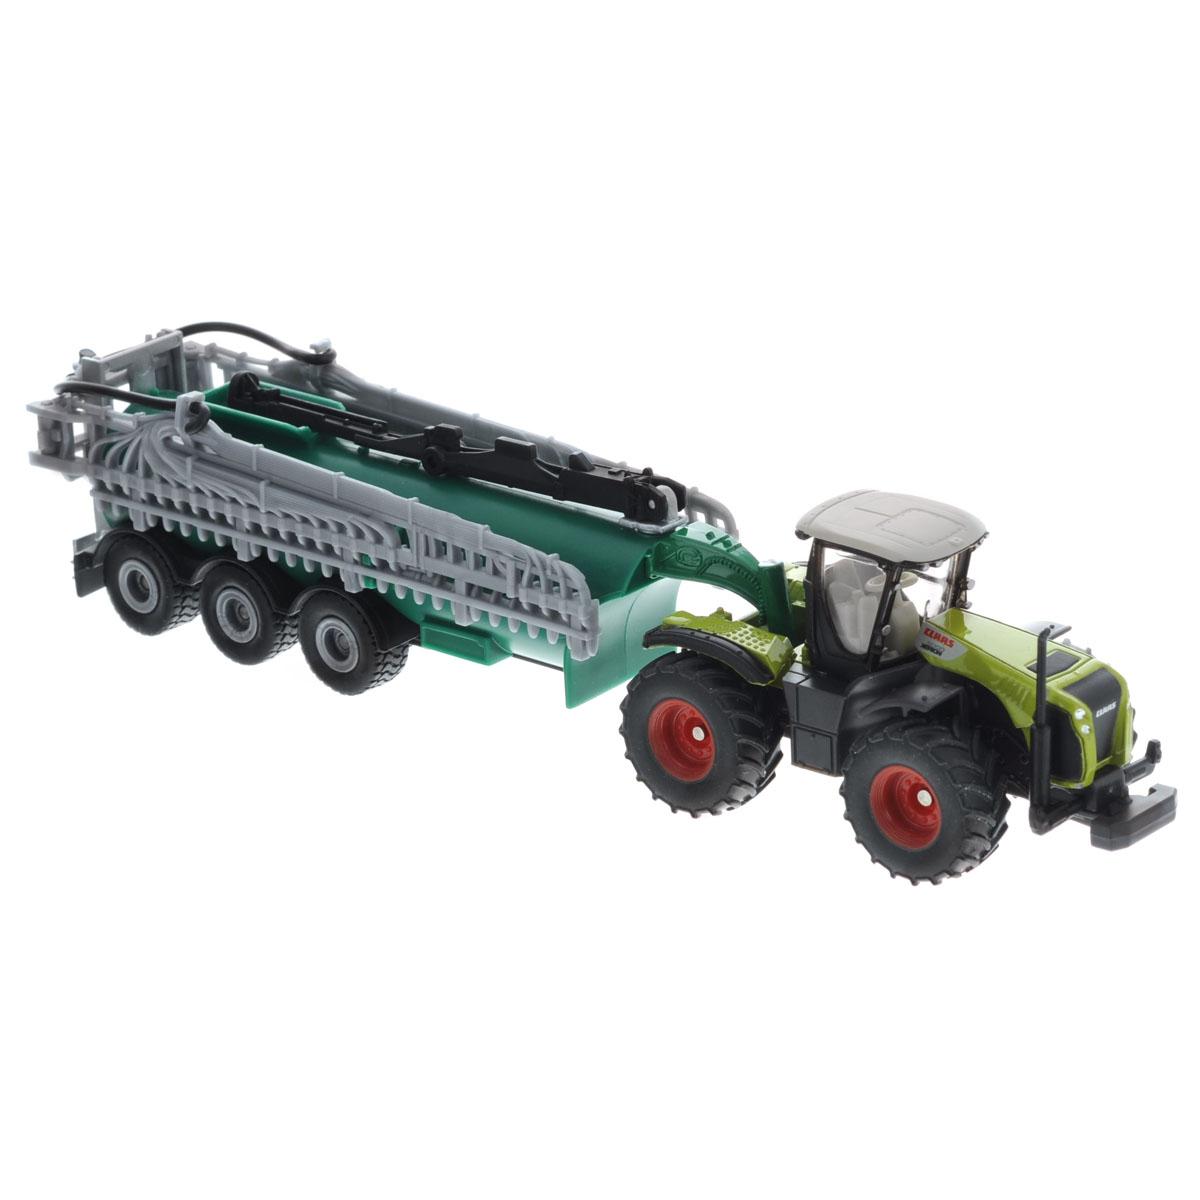 Siku Трактор Claas Xerion с вакуумным баком Samson